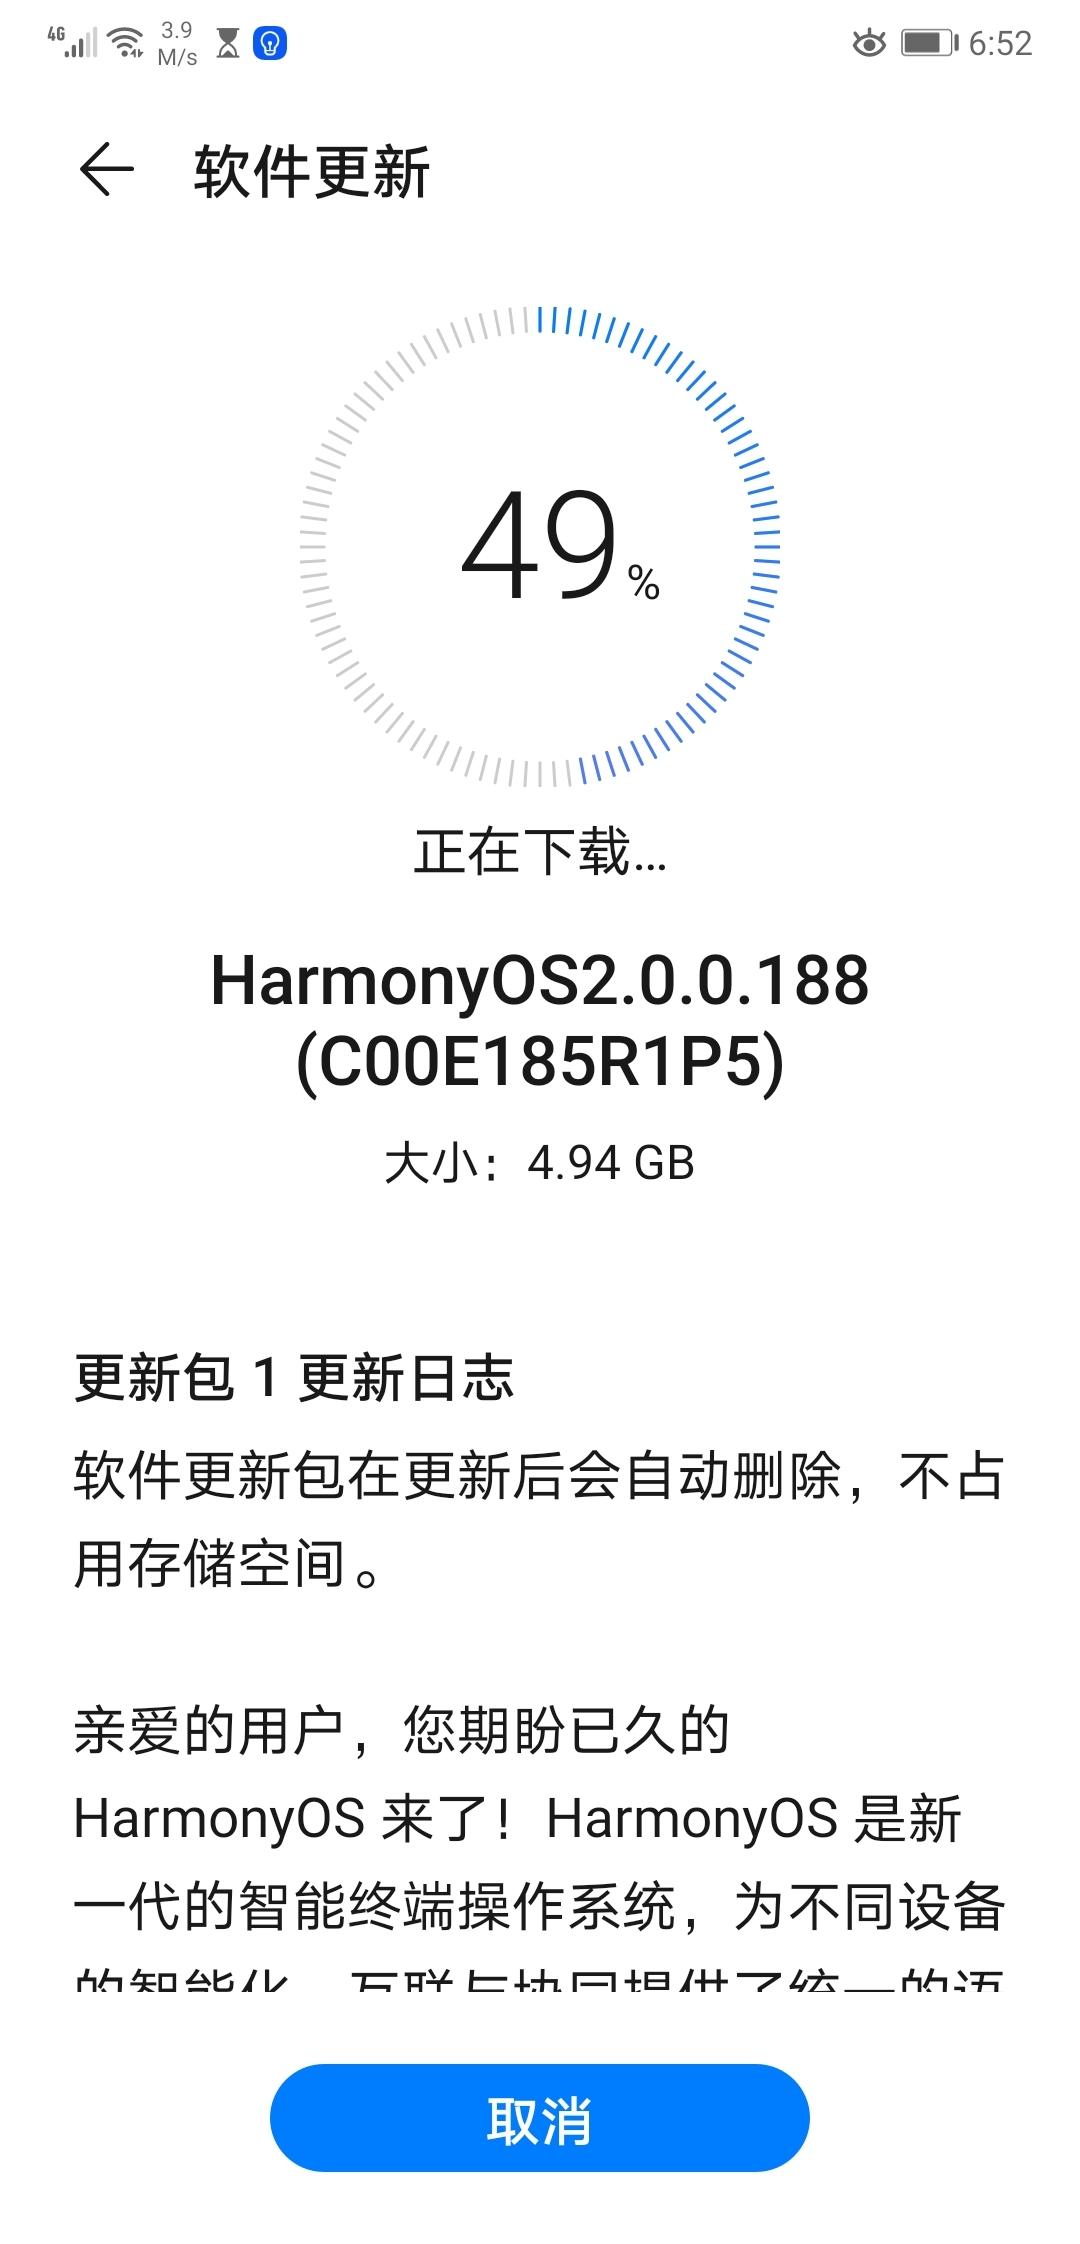 Screenshot_20210915_185245_com.huawei.android.hwouc.jpg